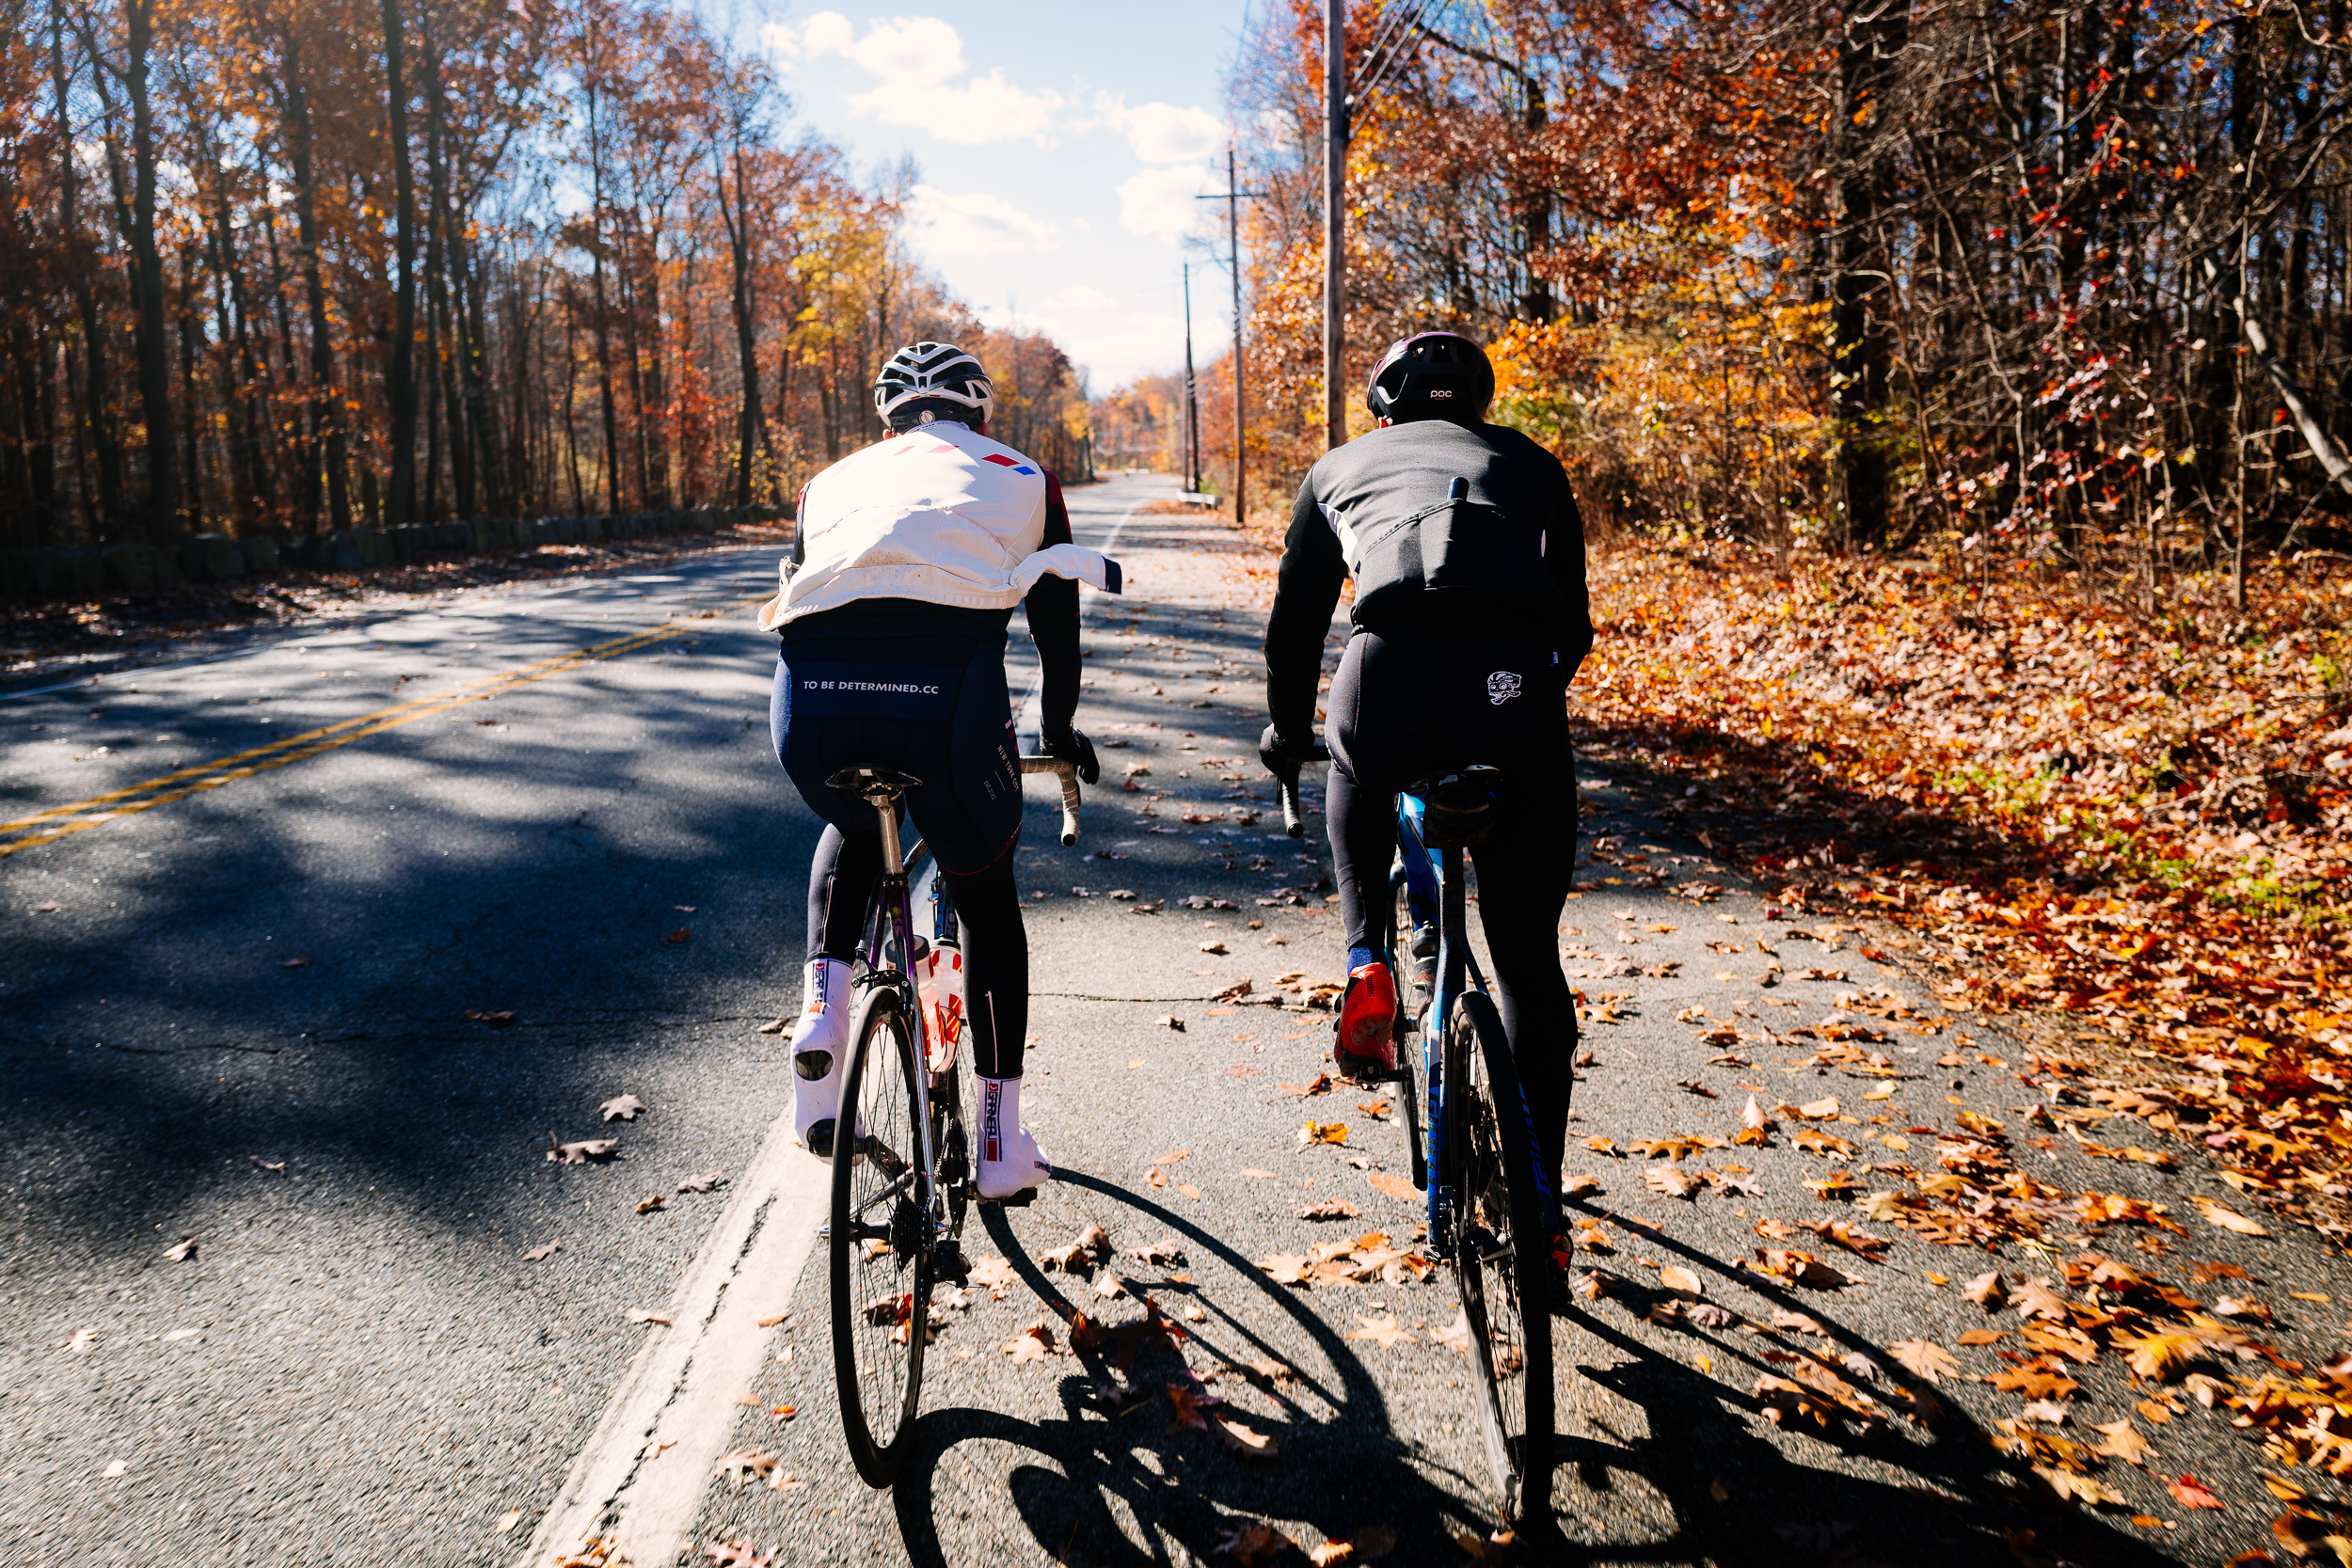 photo-rhetoric-to-be-determined-river-road-fall-foliage-5039.jpg